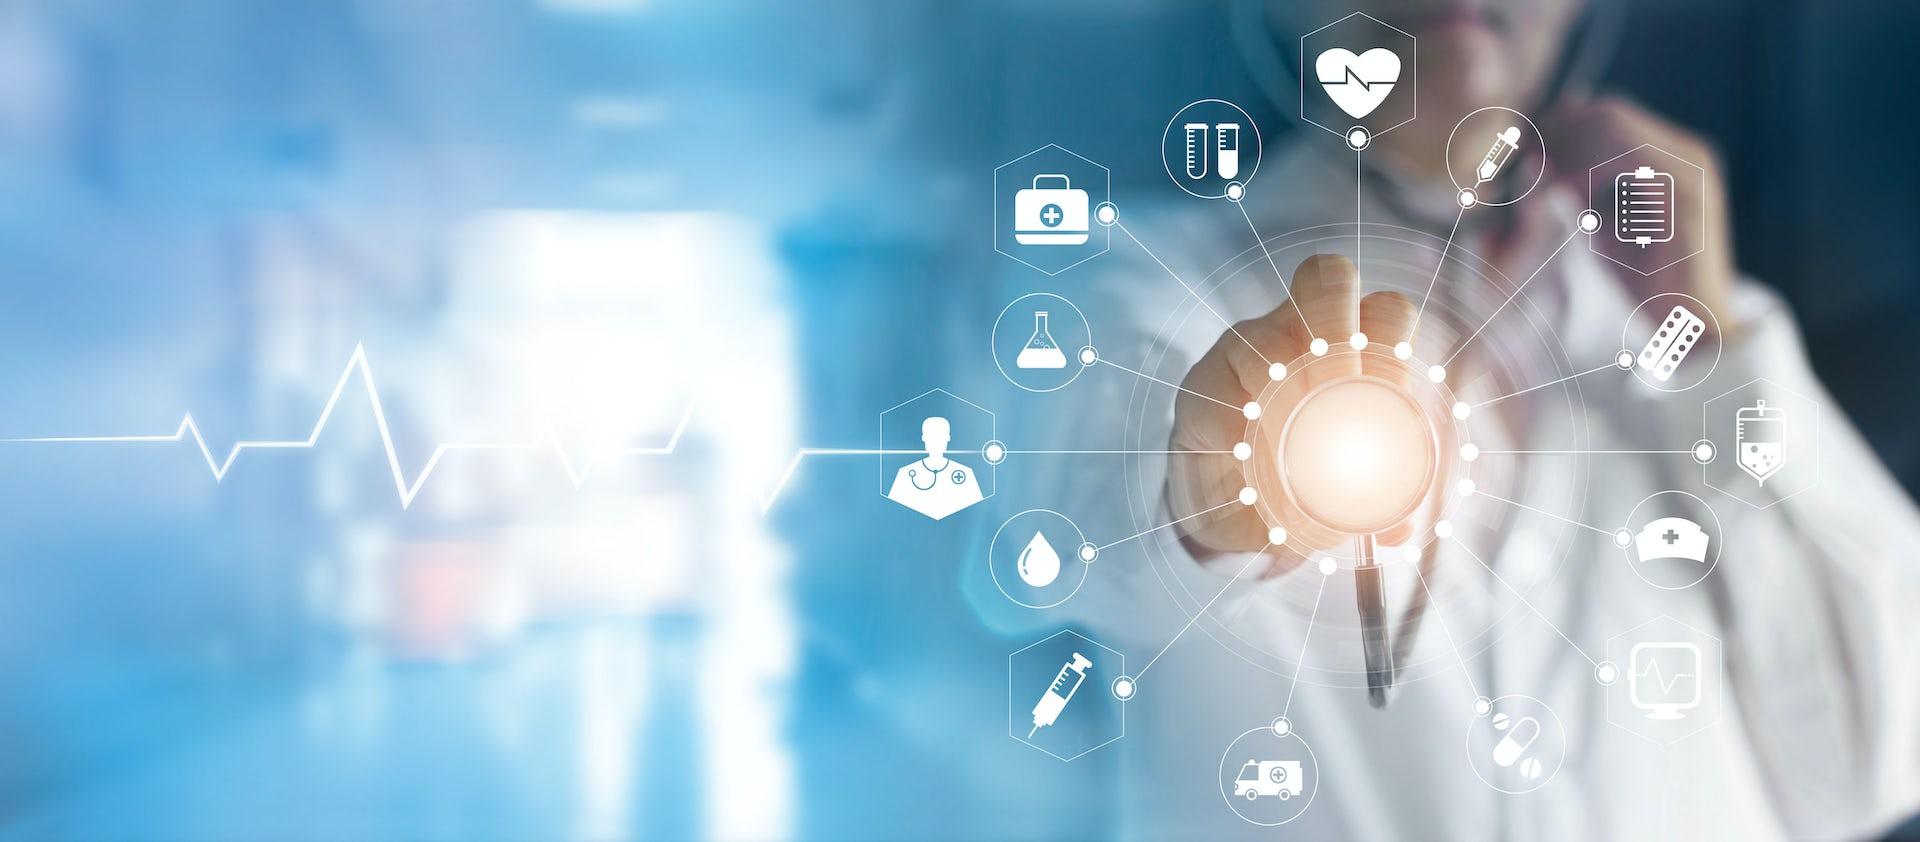 US health care companies begin exploring blockchain technologies